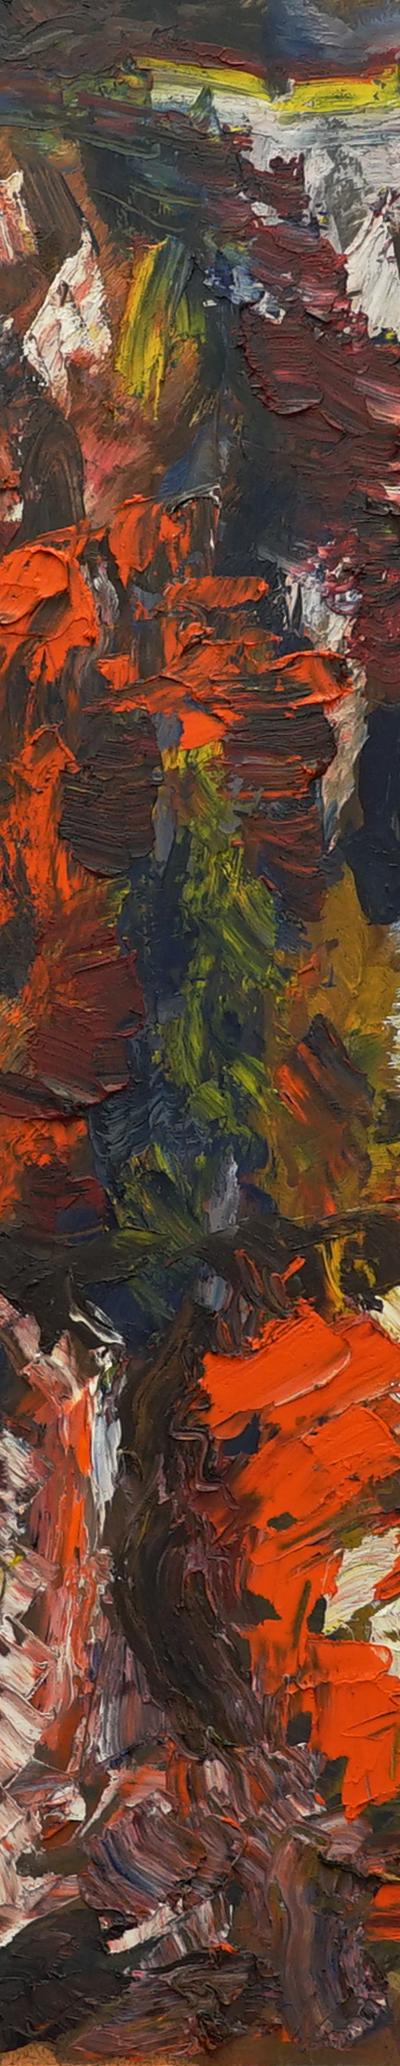 study 68x92 cm, oil on paper